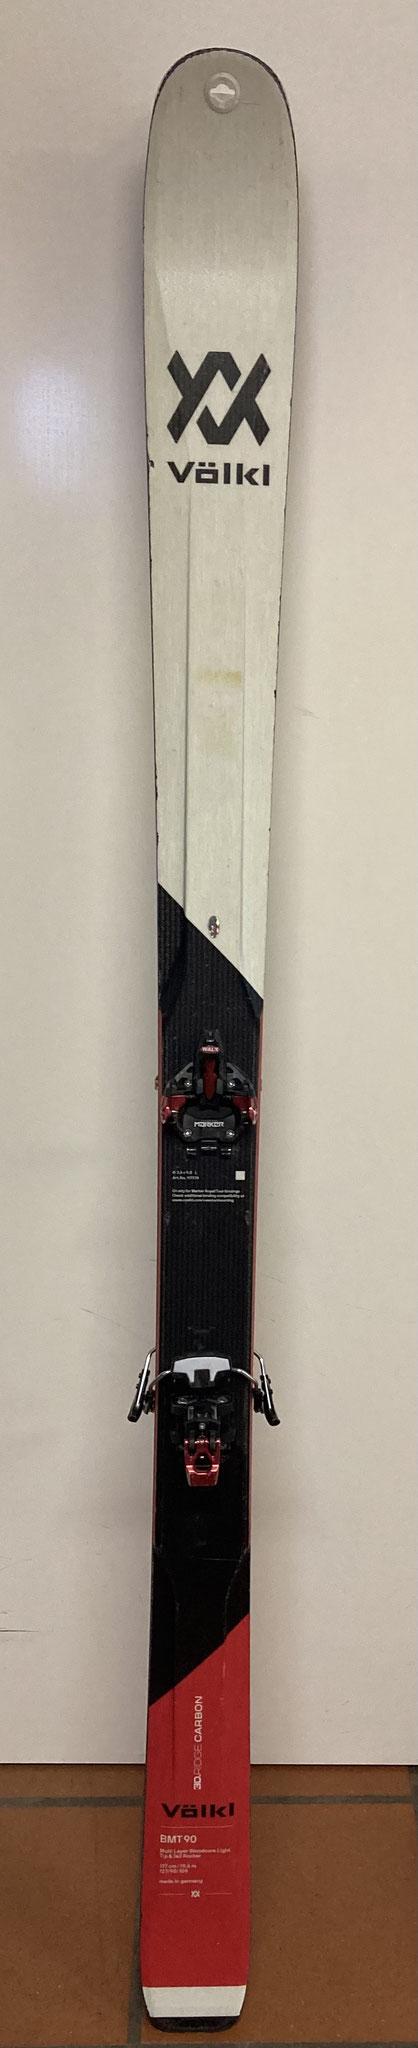 Völkl BMT 90, Länge 178cm, Waist 90mm, Bindung Marker Alpinist